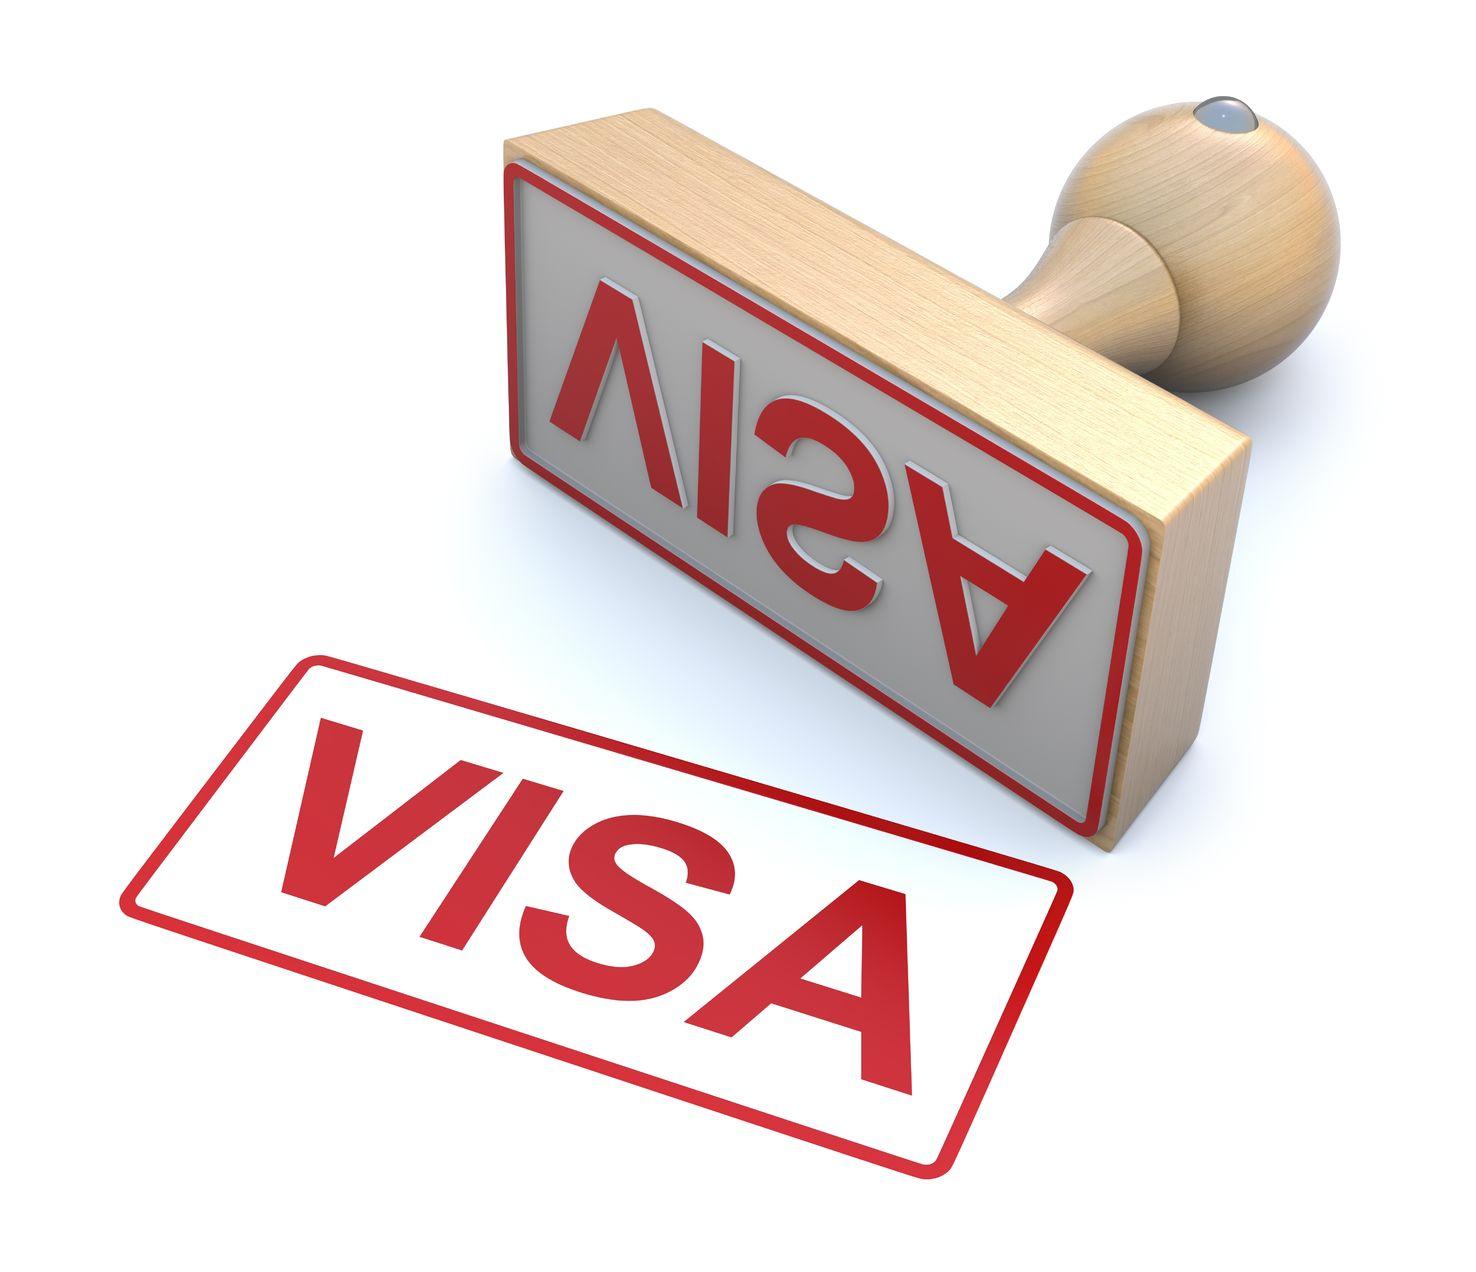 10831740 - rubber stamp - visa